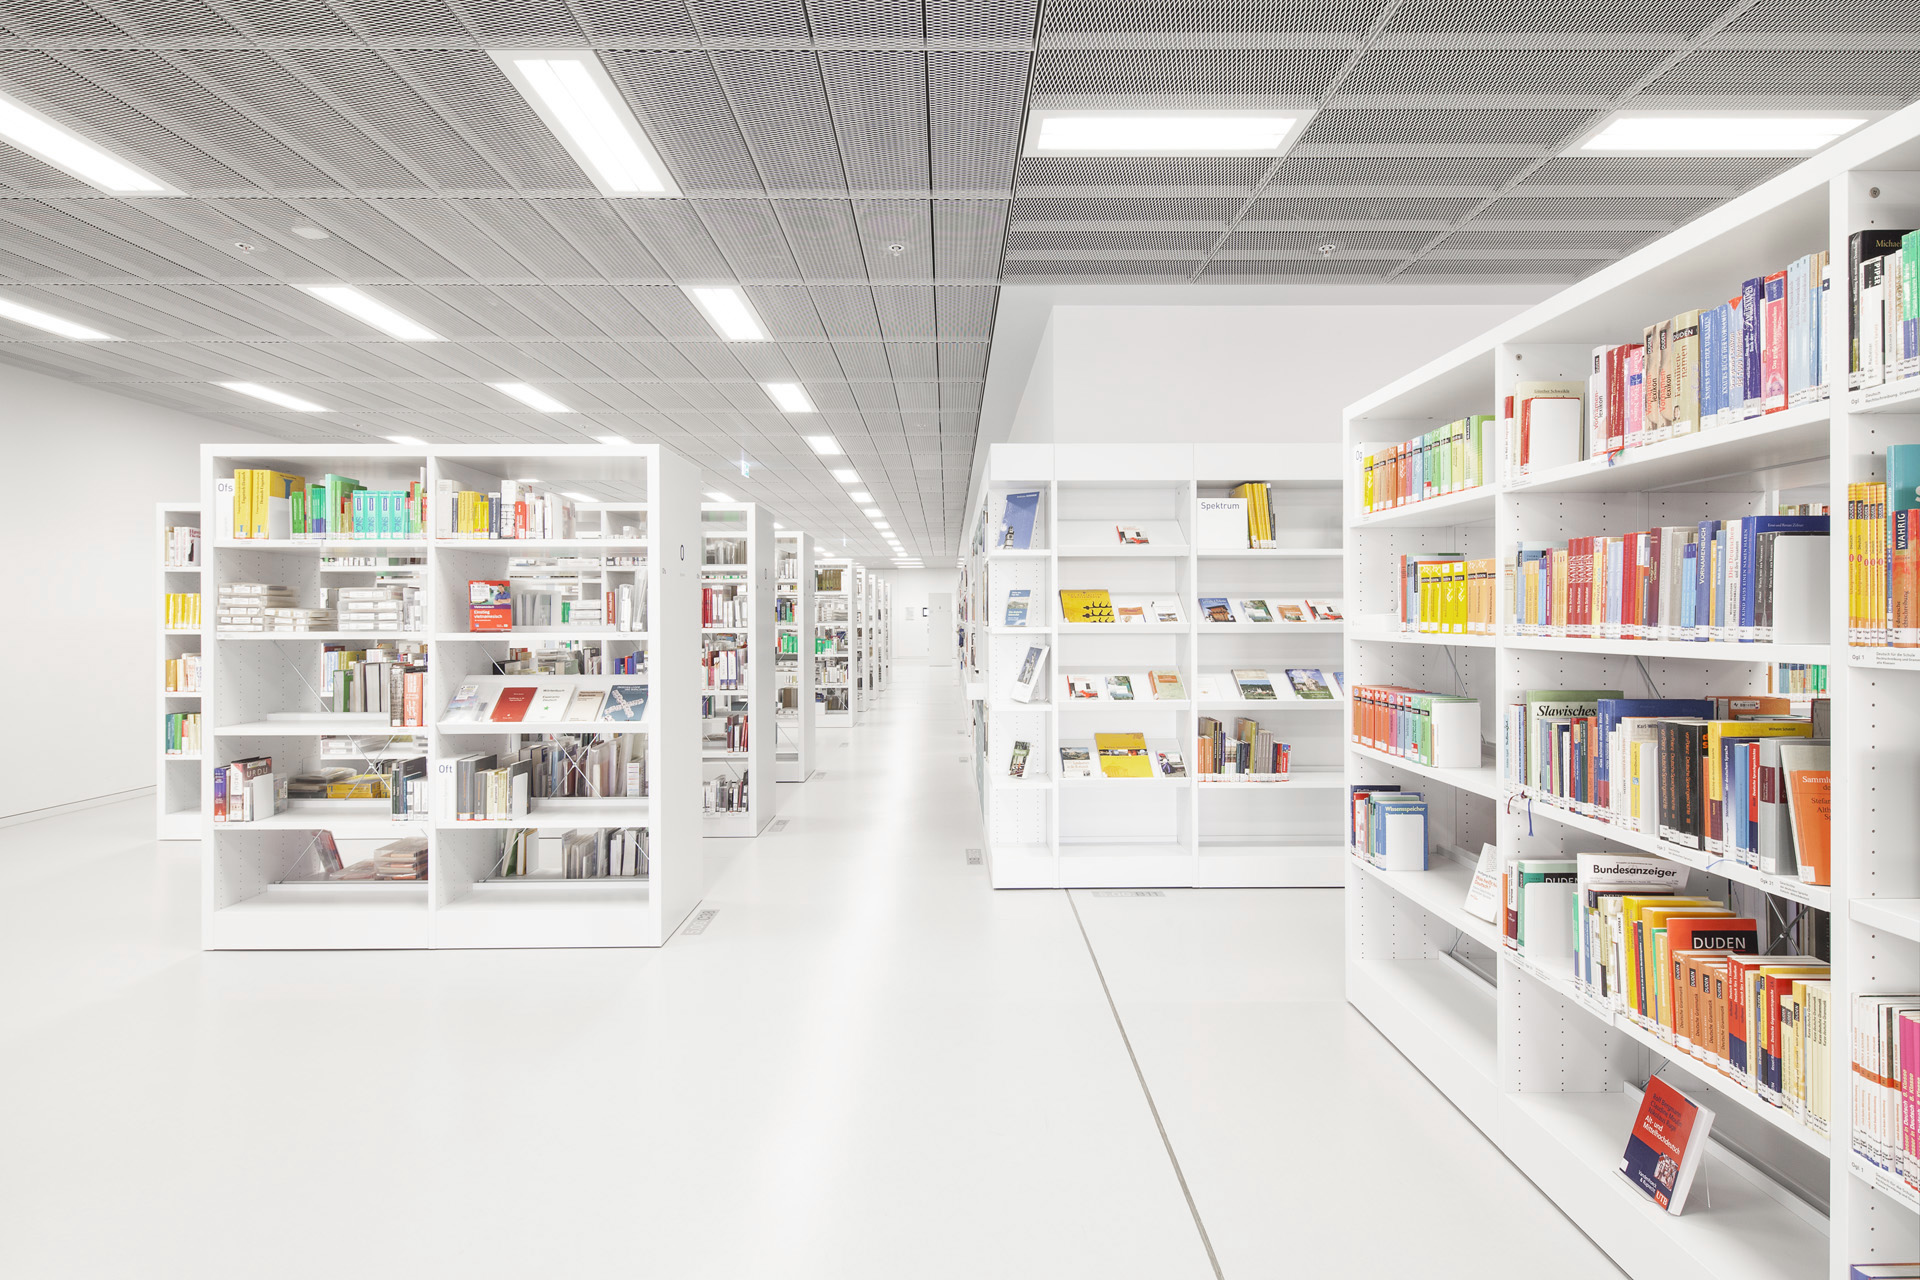 MG 0067 - Stadtbibliothek Stuttgart